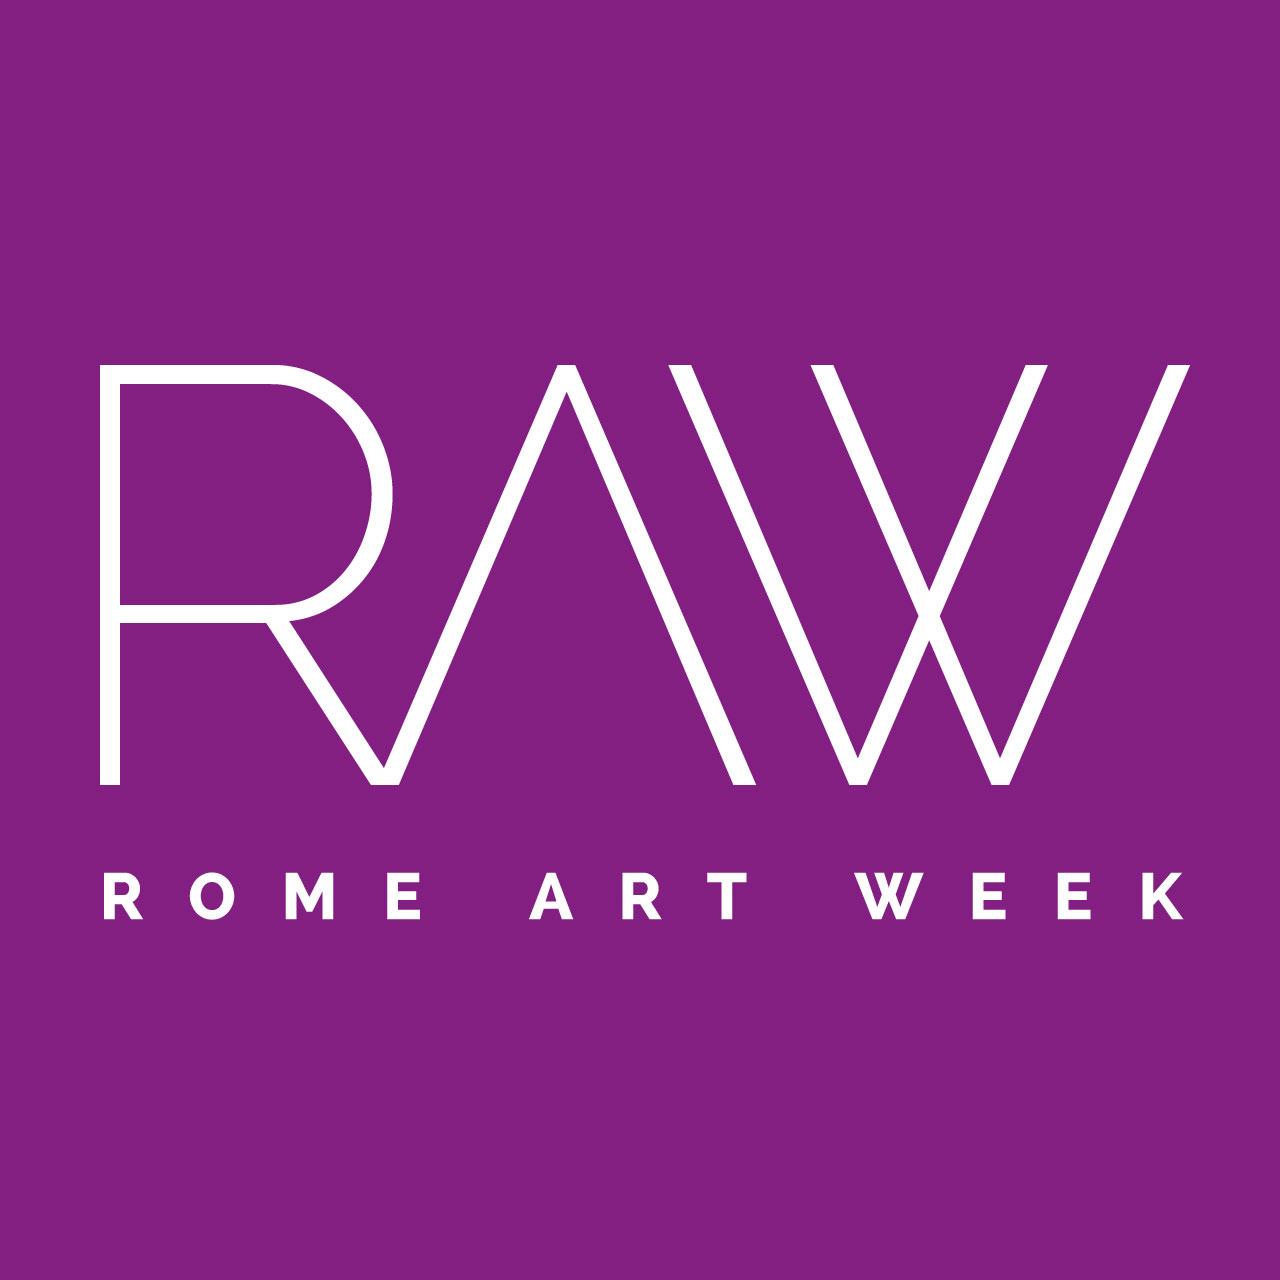 Rome Art Week dal 9 al 14 ottobre